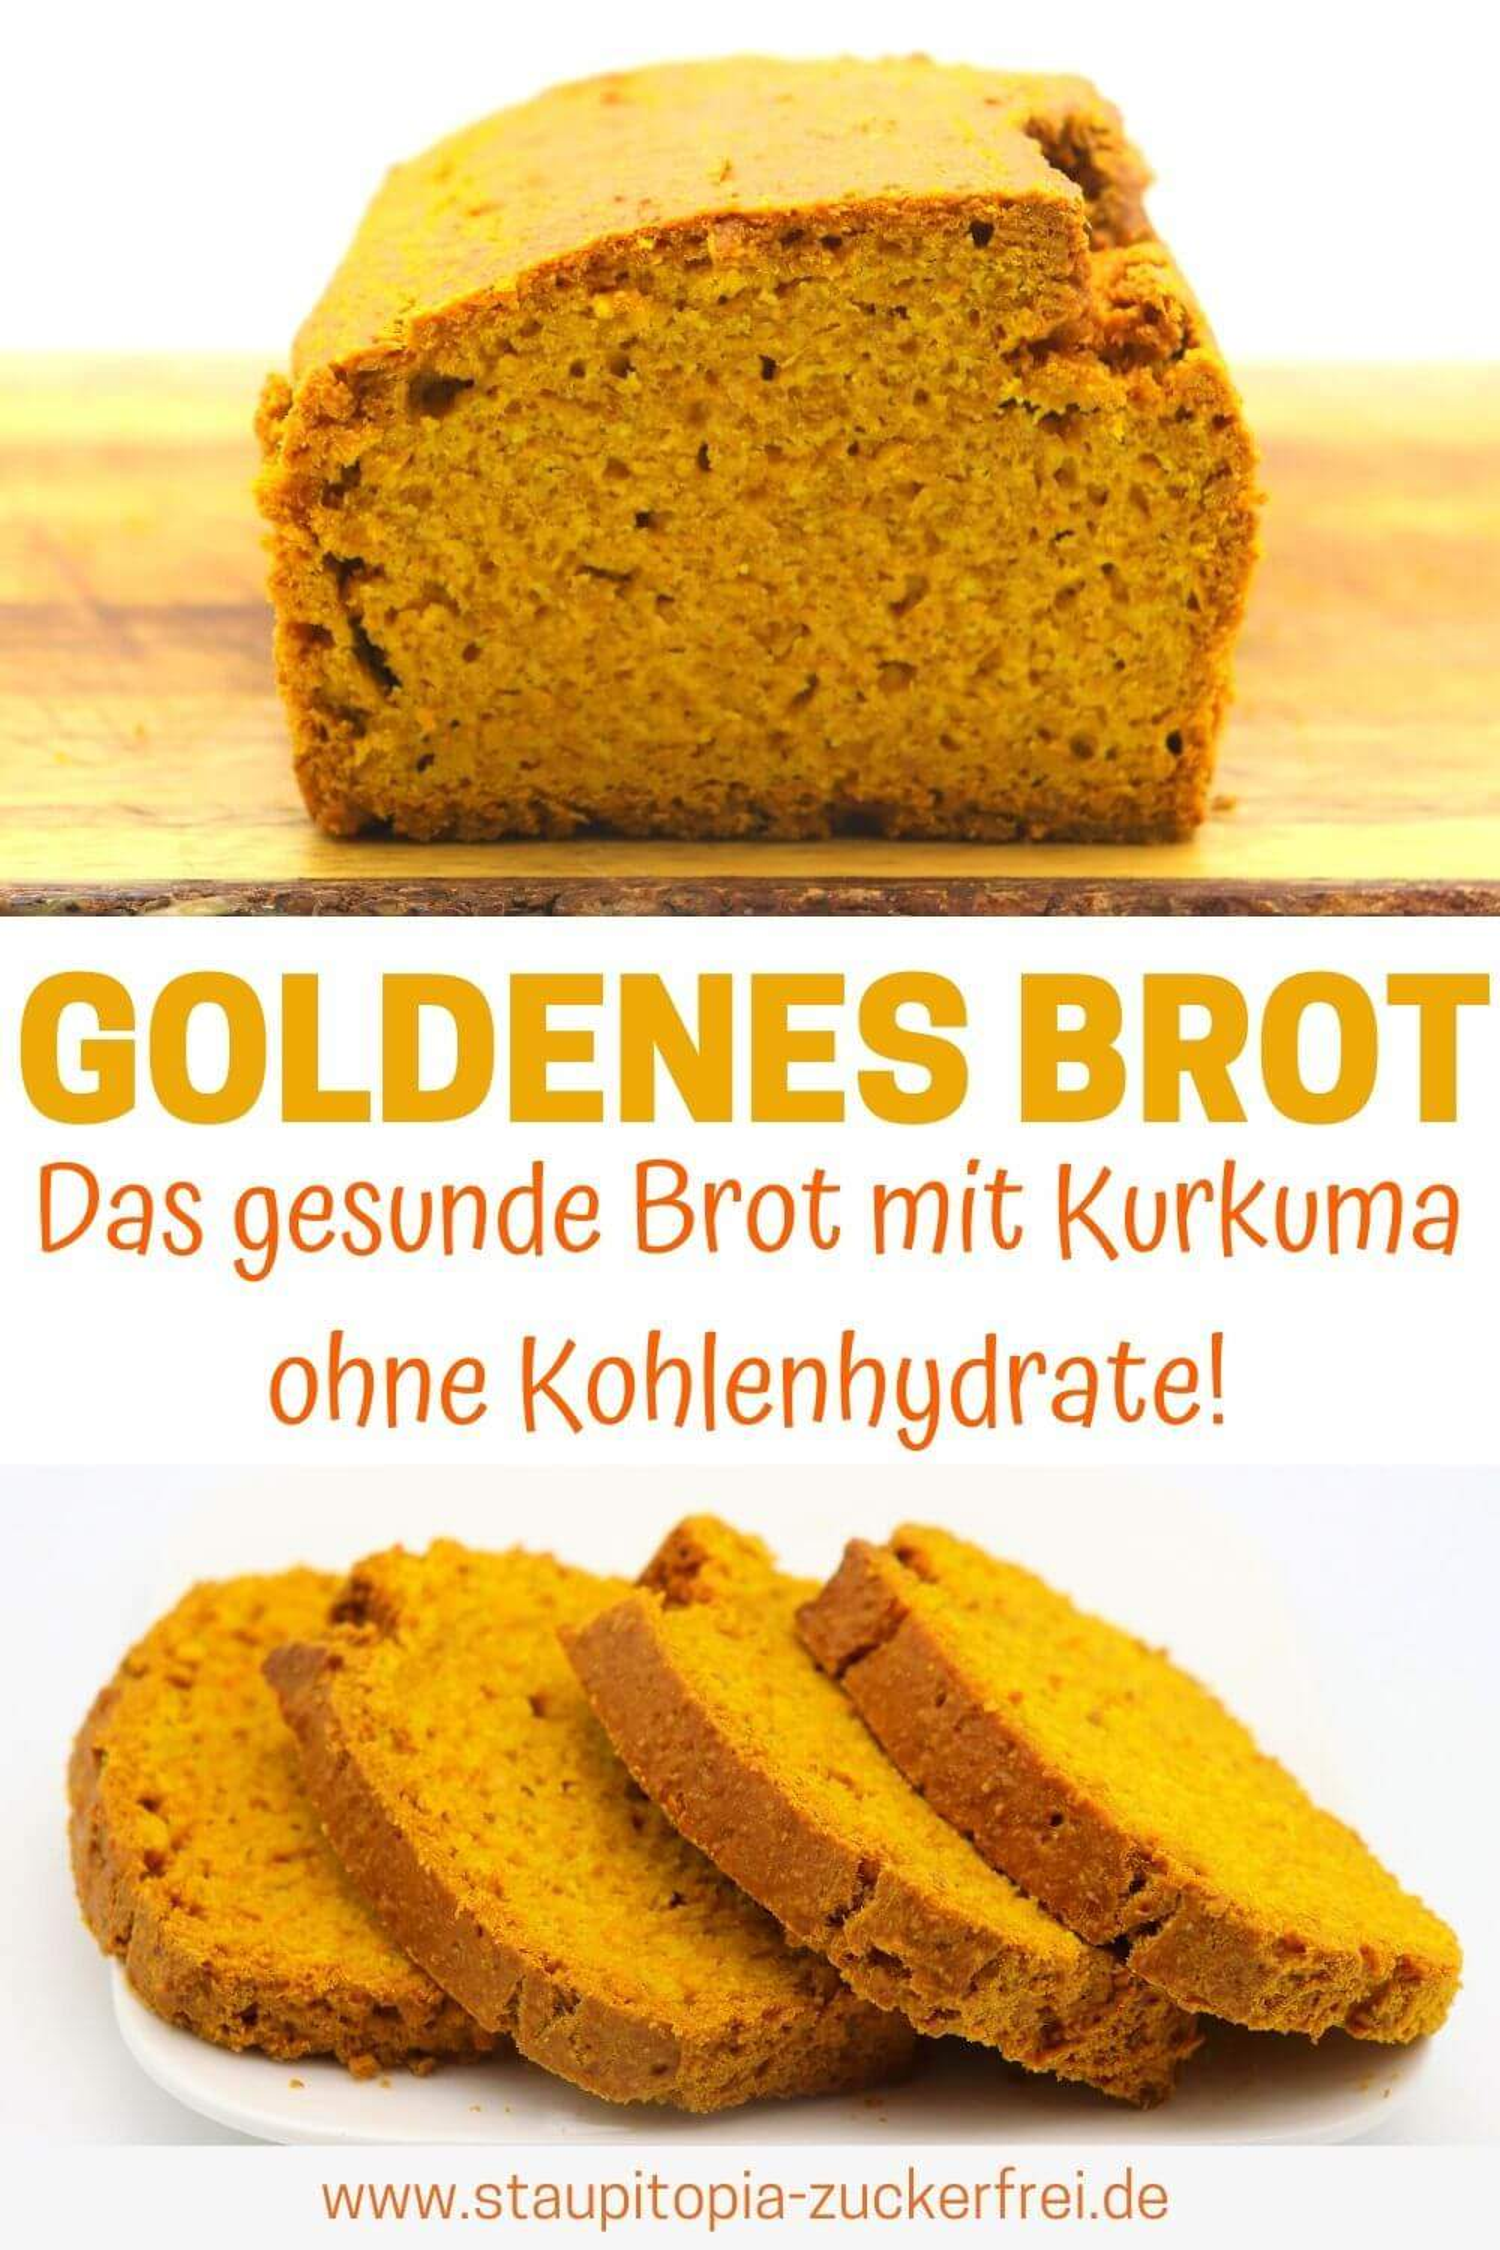 Goldenes Brot: Das gesunde Brot ohne Kohlenhydrate mit Kurkuma